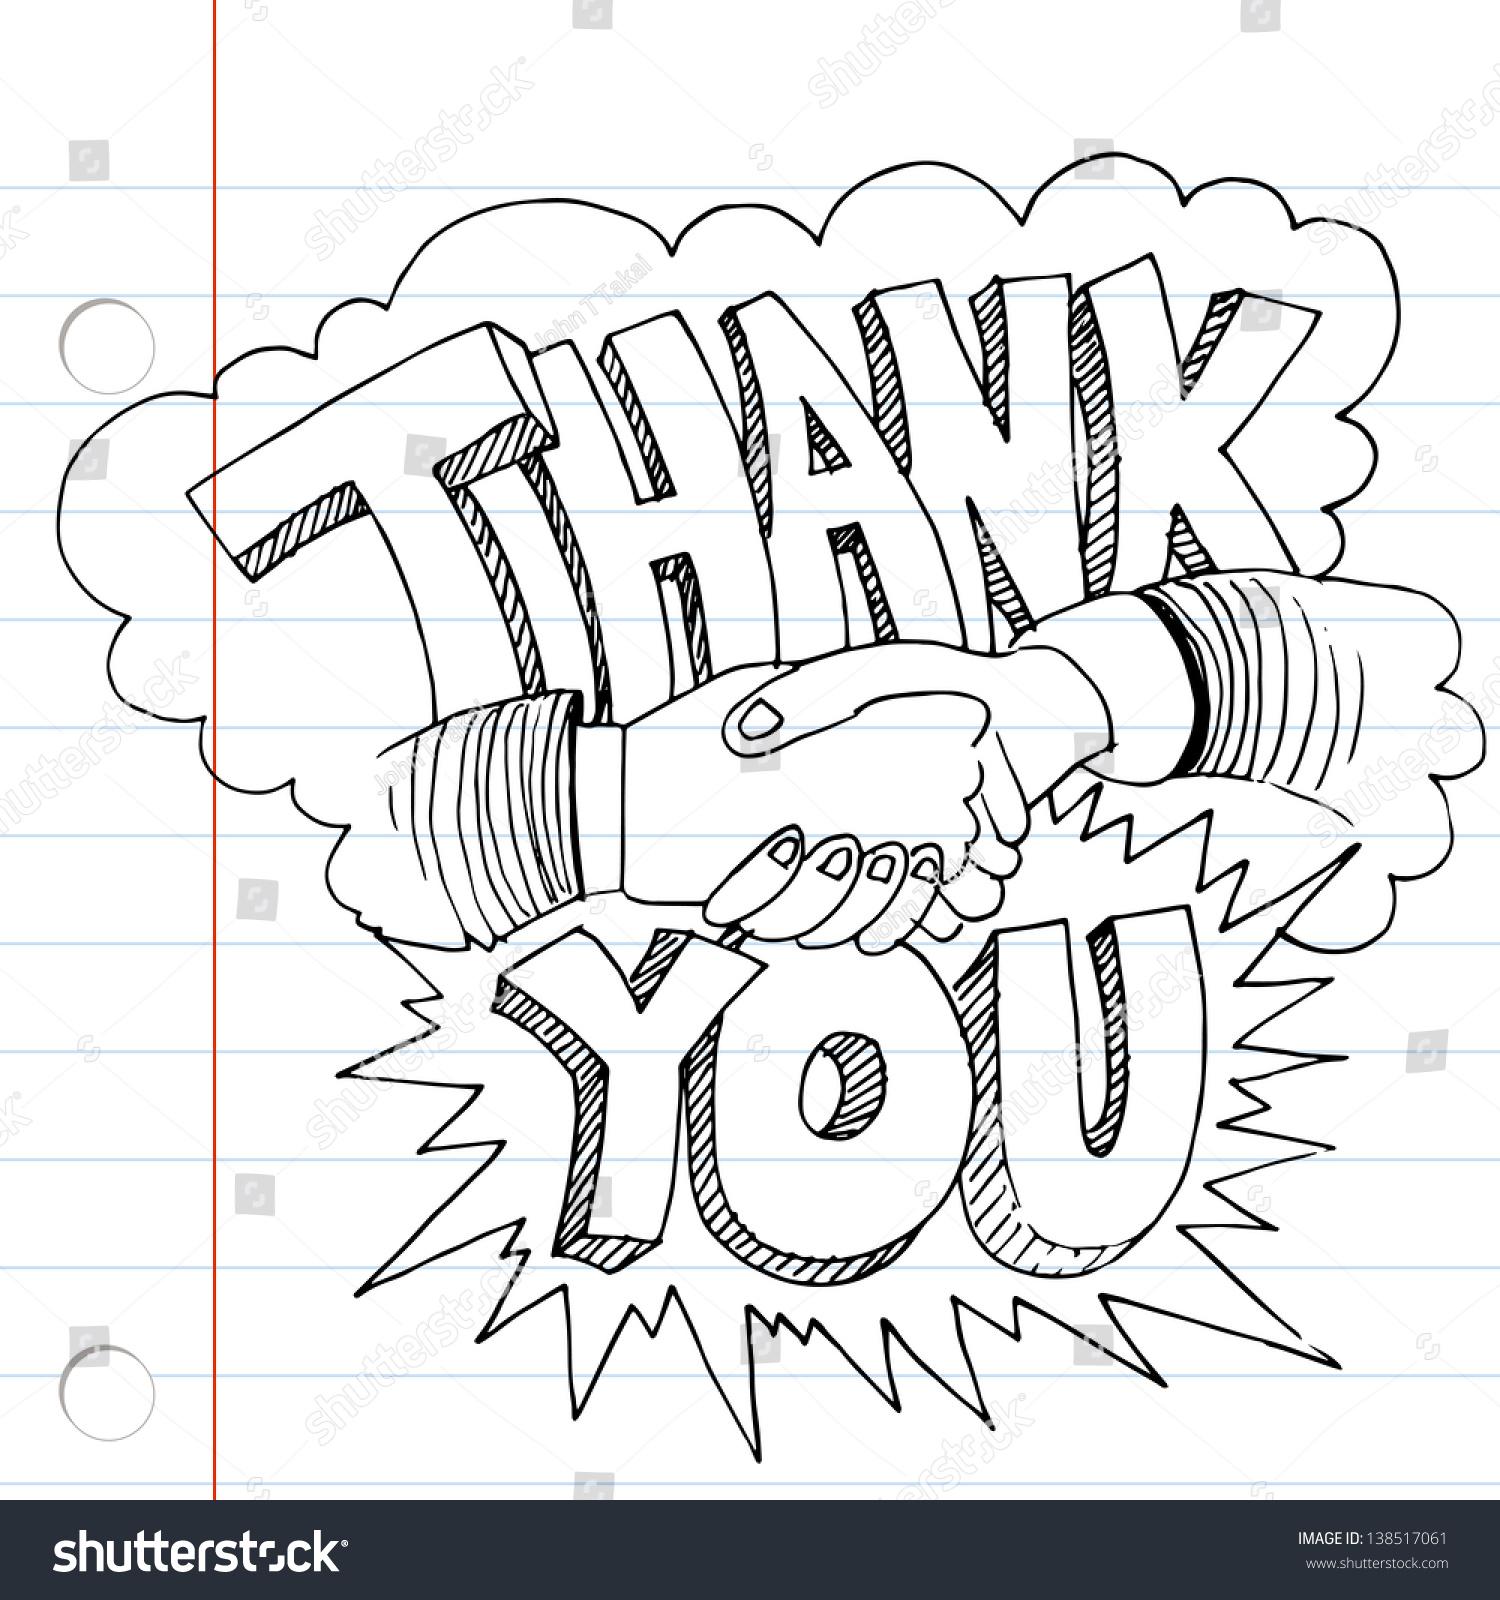 image thank you handshake drawing stock illustration 138517061